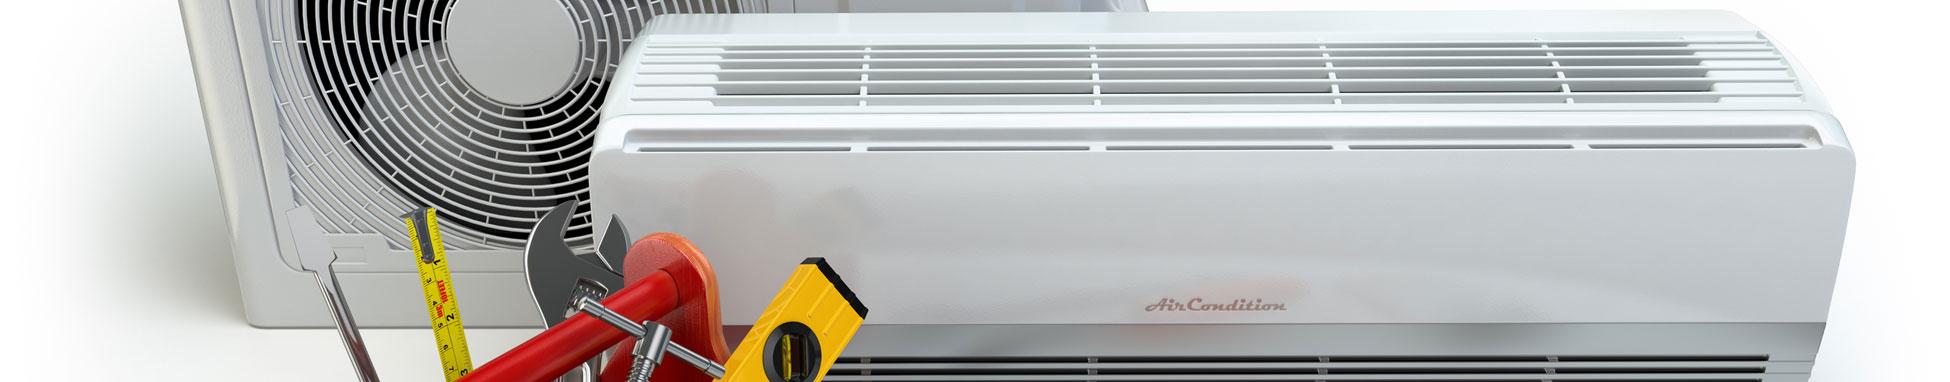 Distributeur en climatisation agrée Samsung